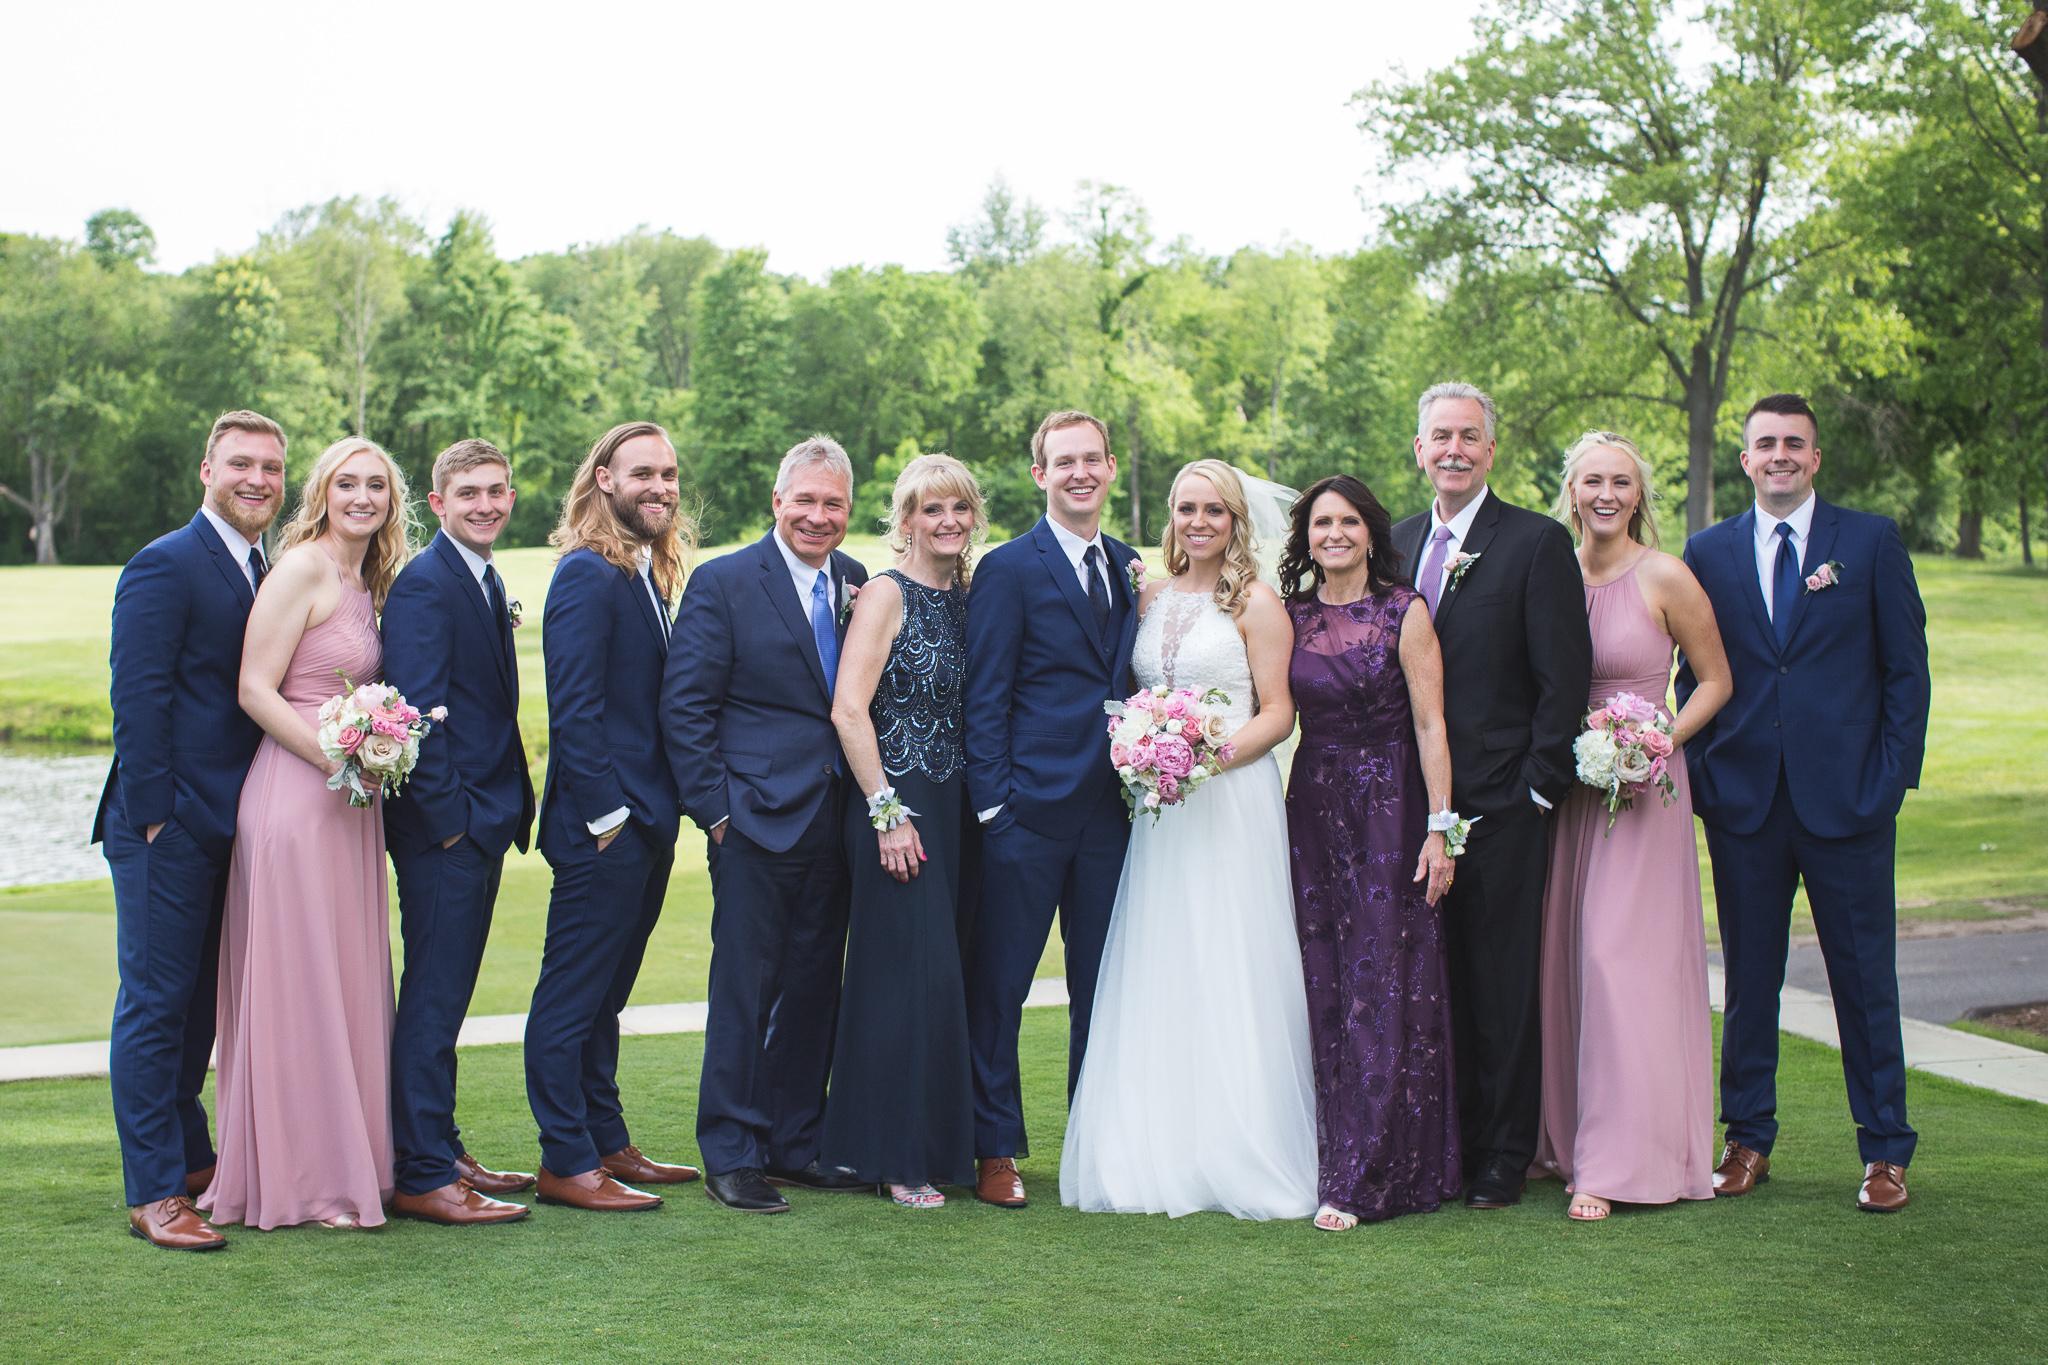 108-best-detroit-michigan-outdoor-wedding-photographer.jpg